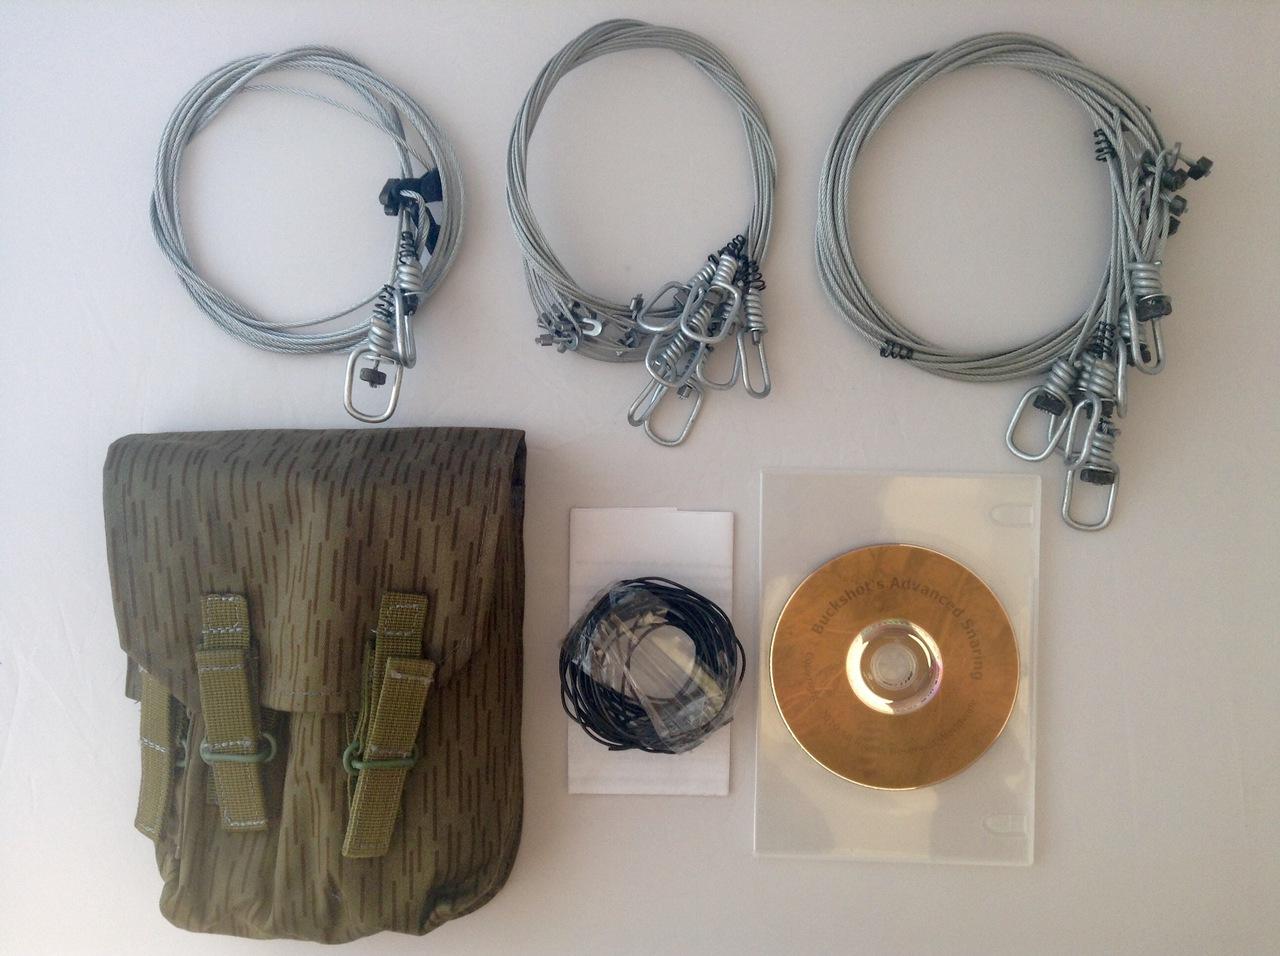 Buckshot's Emergency Snare Kit & Advanced Survival Snaring DVD